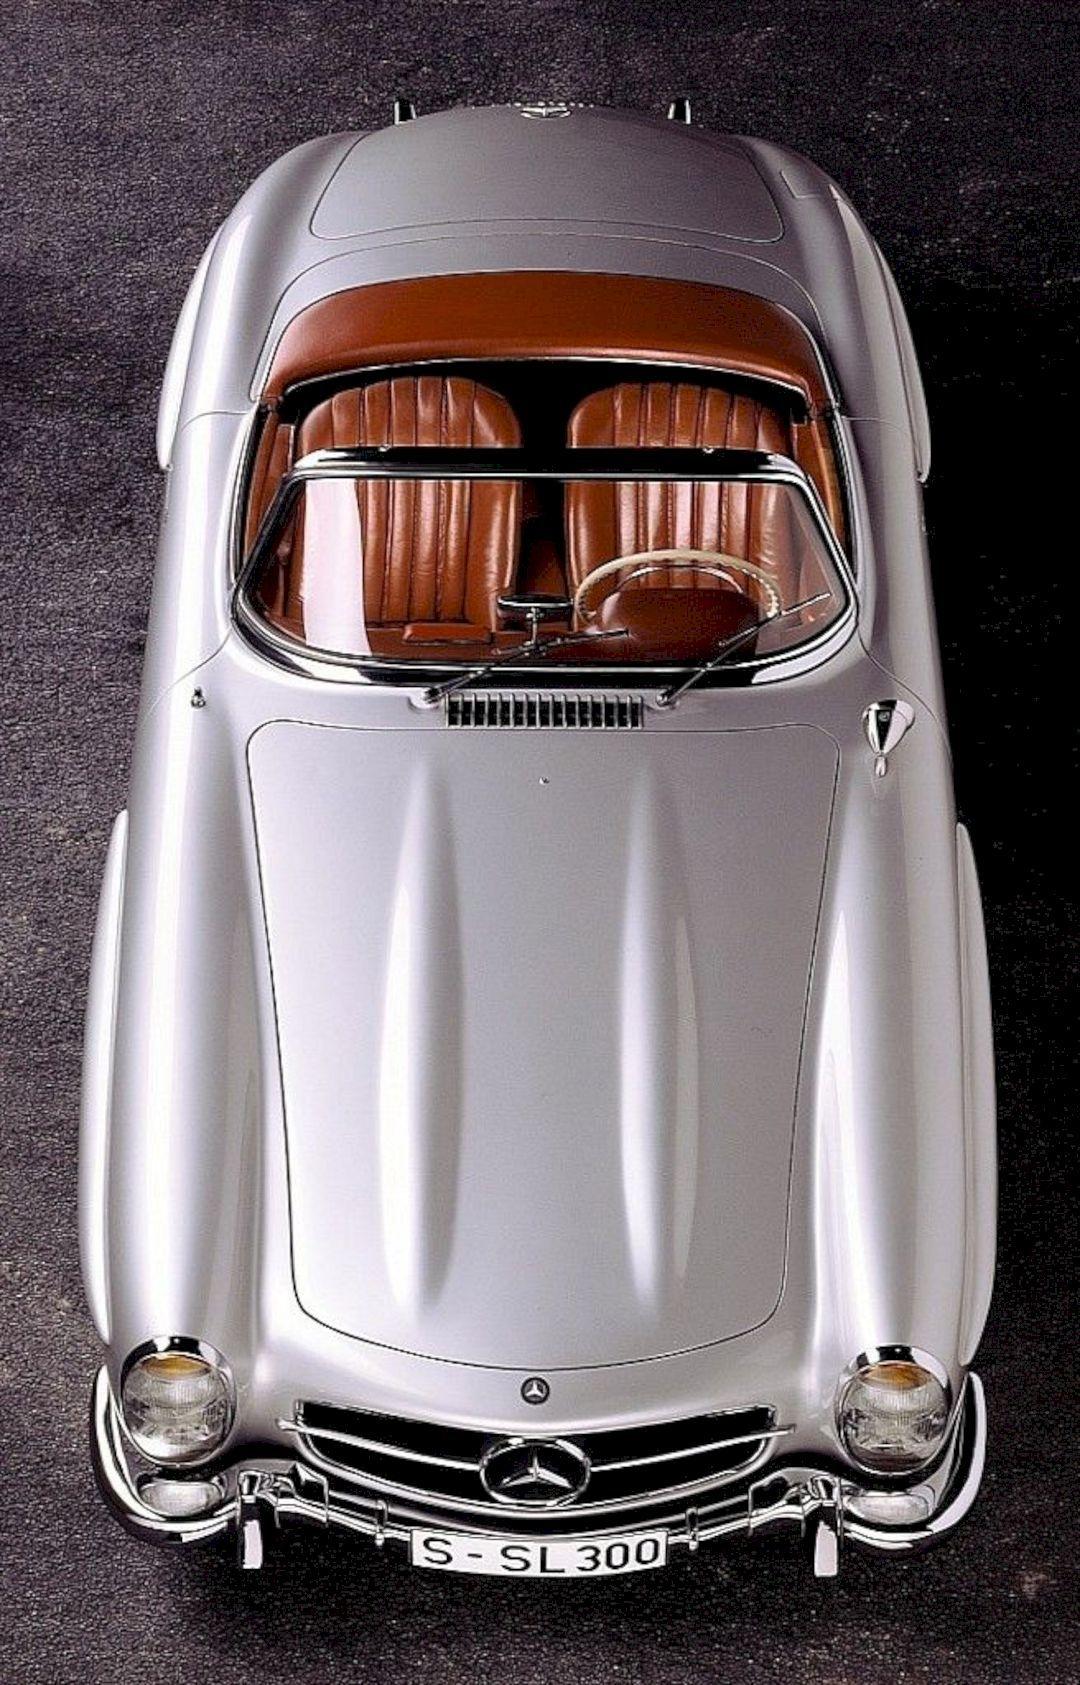 Caterham Seven 270: The Ultimate Classic British Sports Car